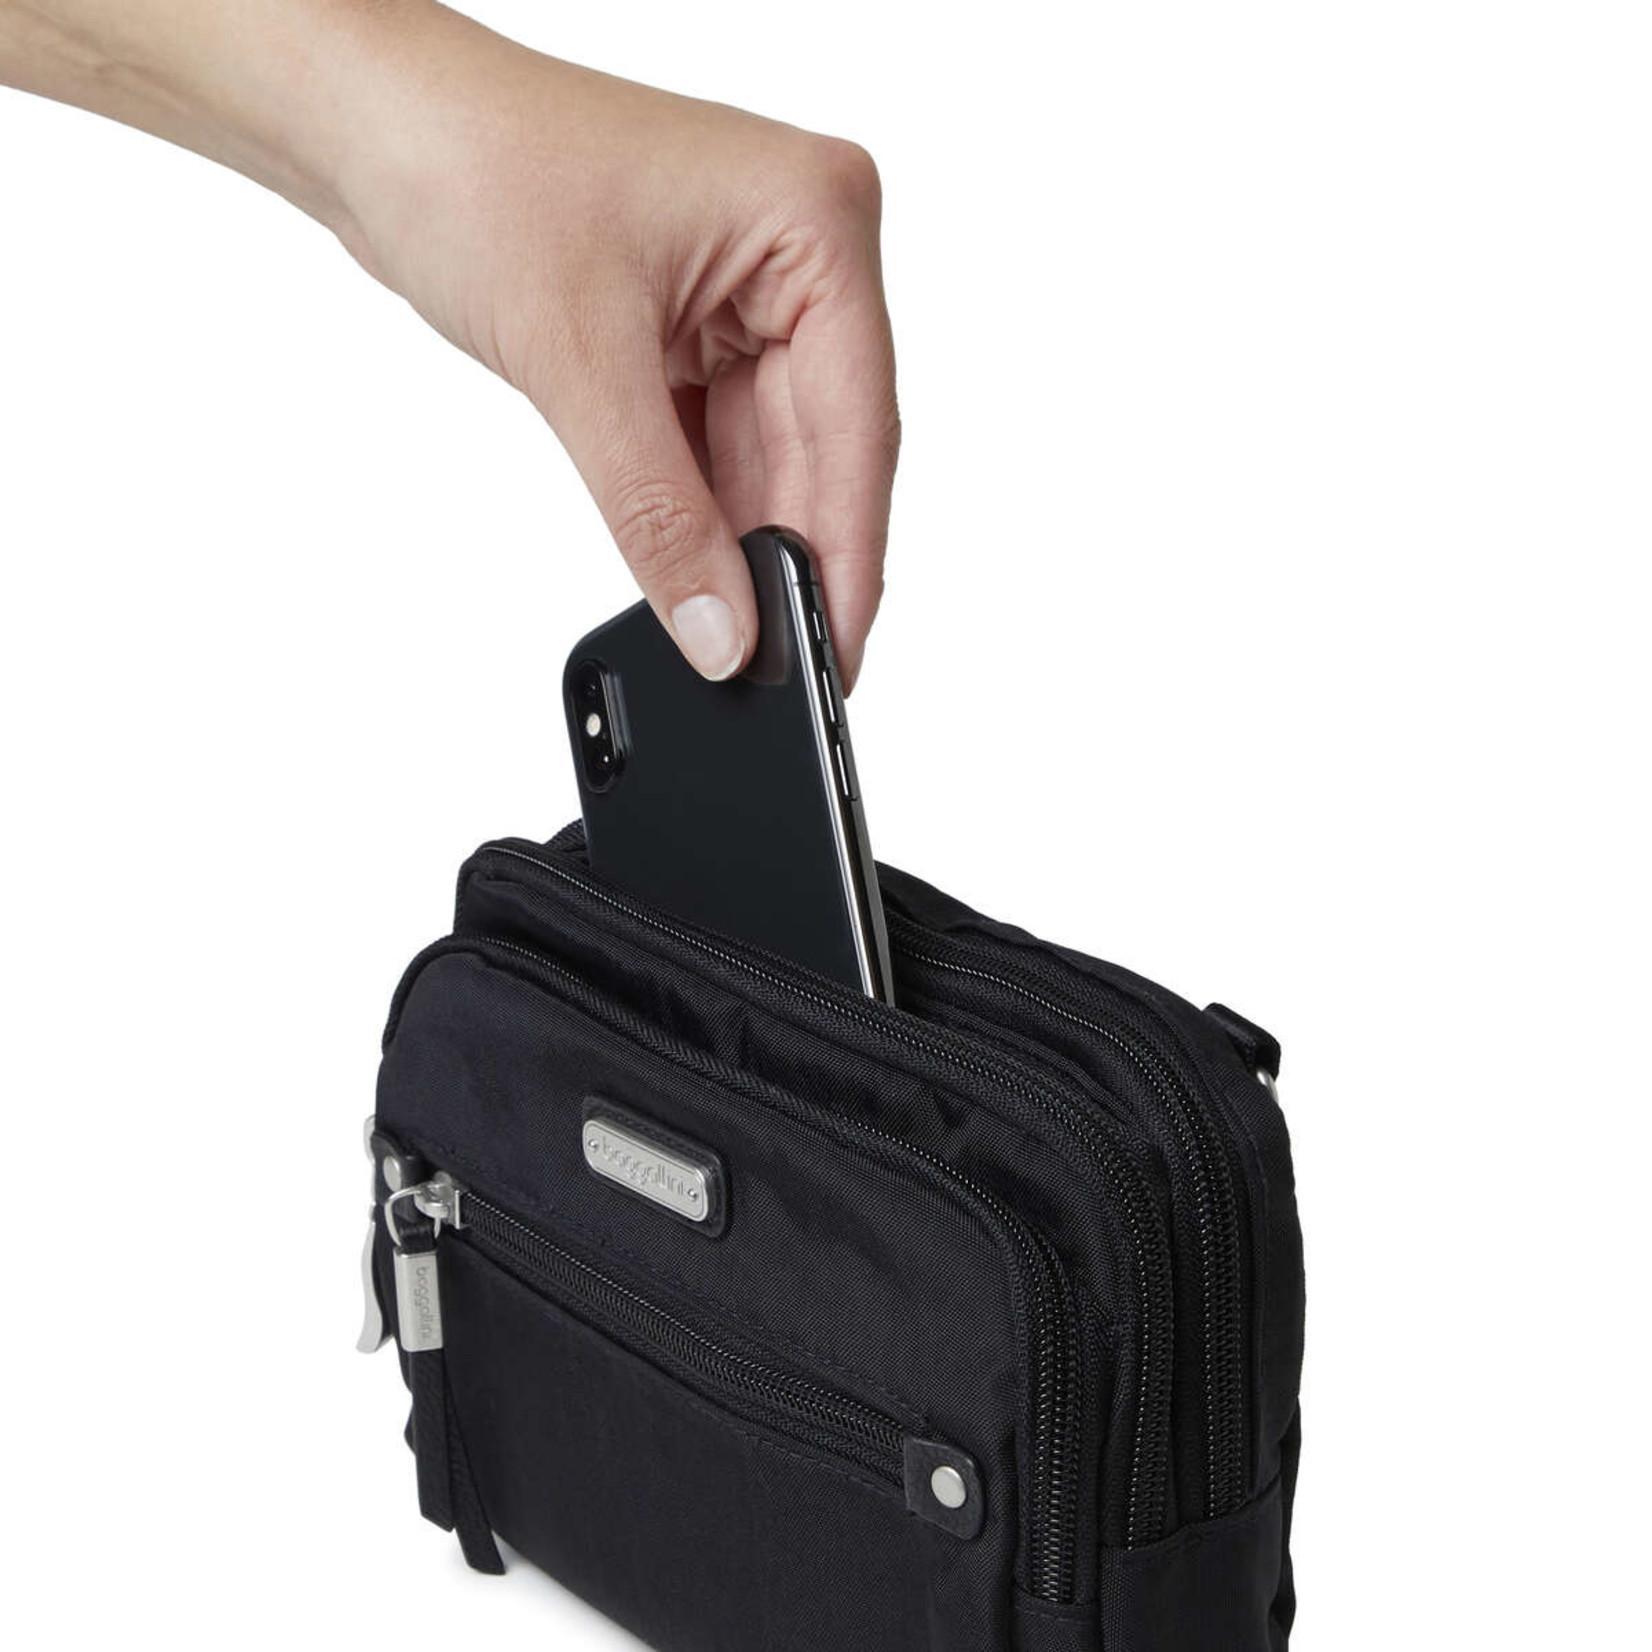 Baggallini TIME ZONE RFID BAG IN BLACK